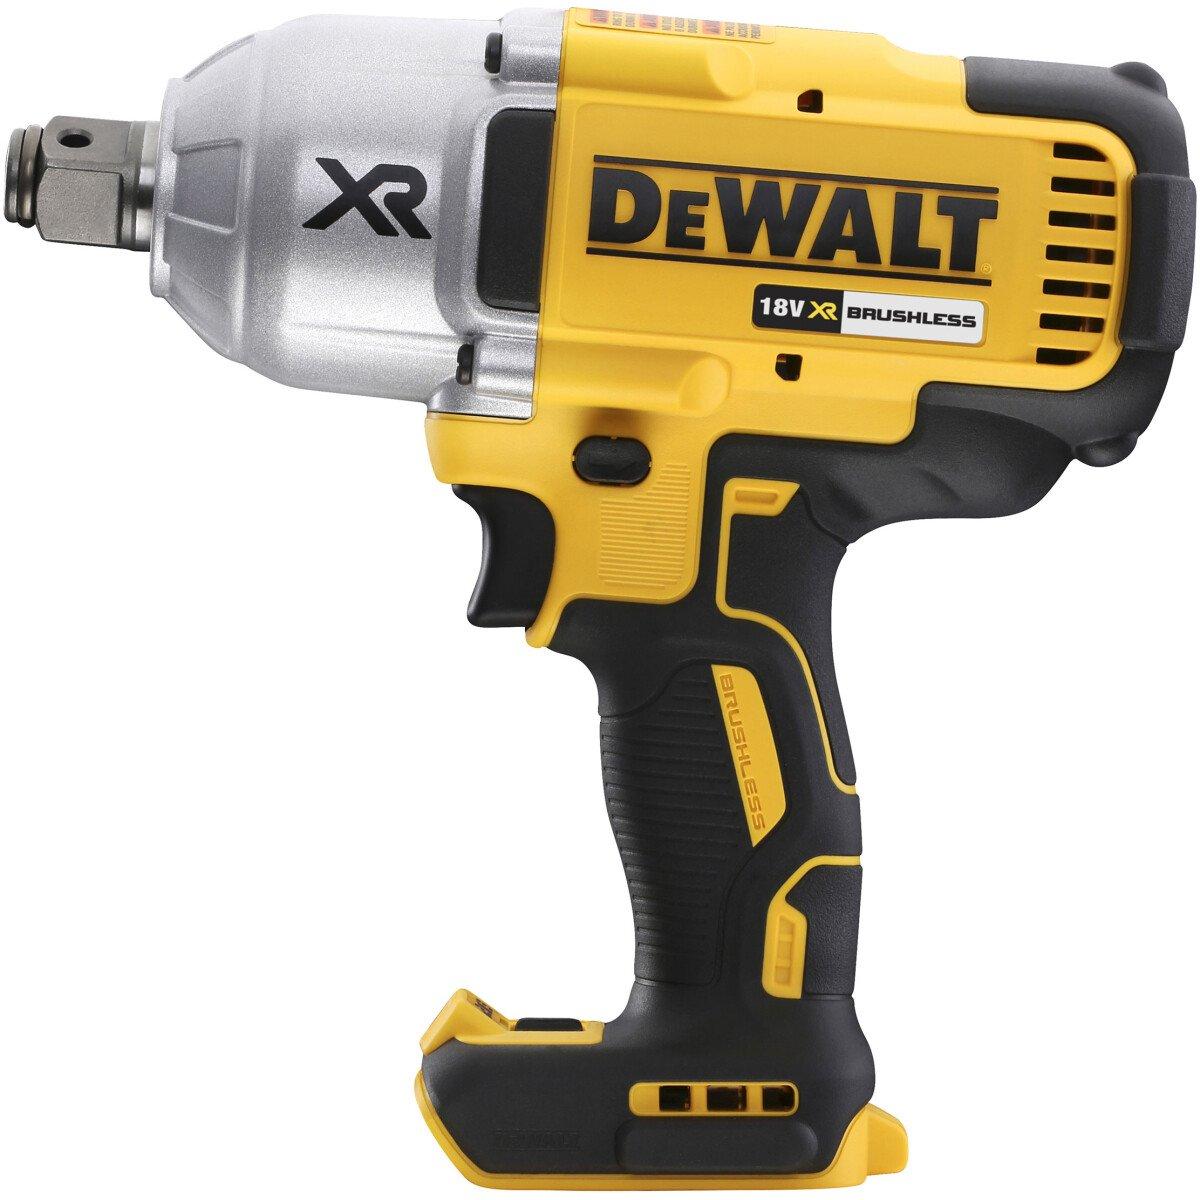 "Dewalt DCF897N-XJ 18V Body Only Brushless 3/4"" Impact Wrench"